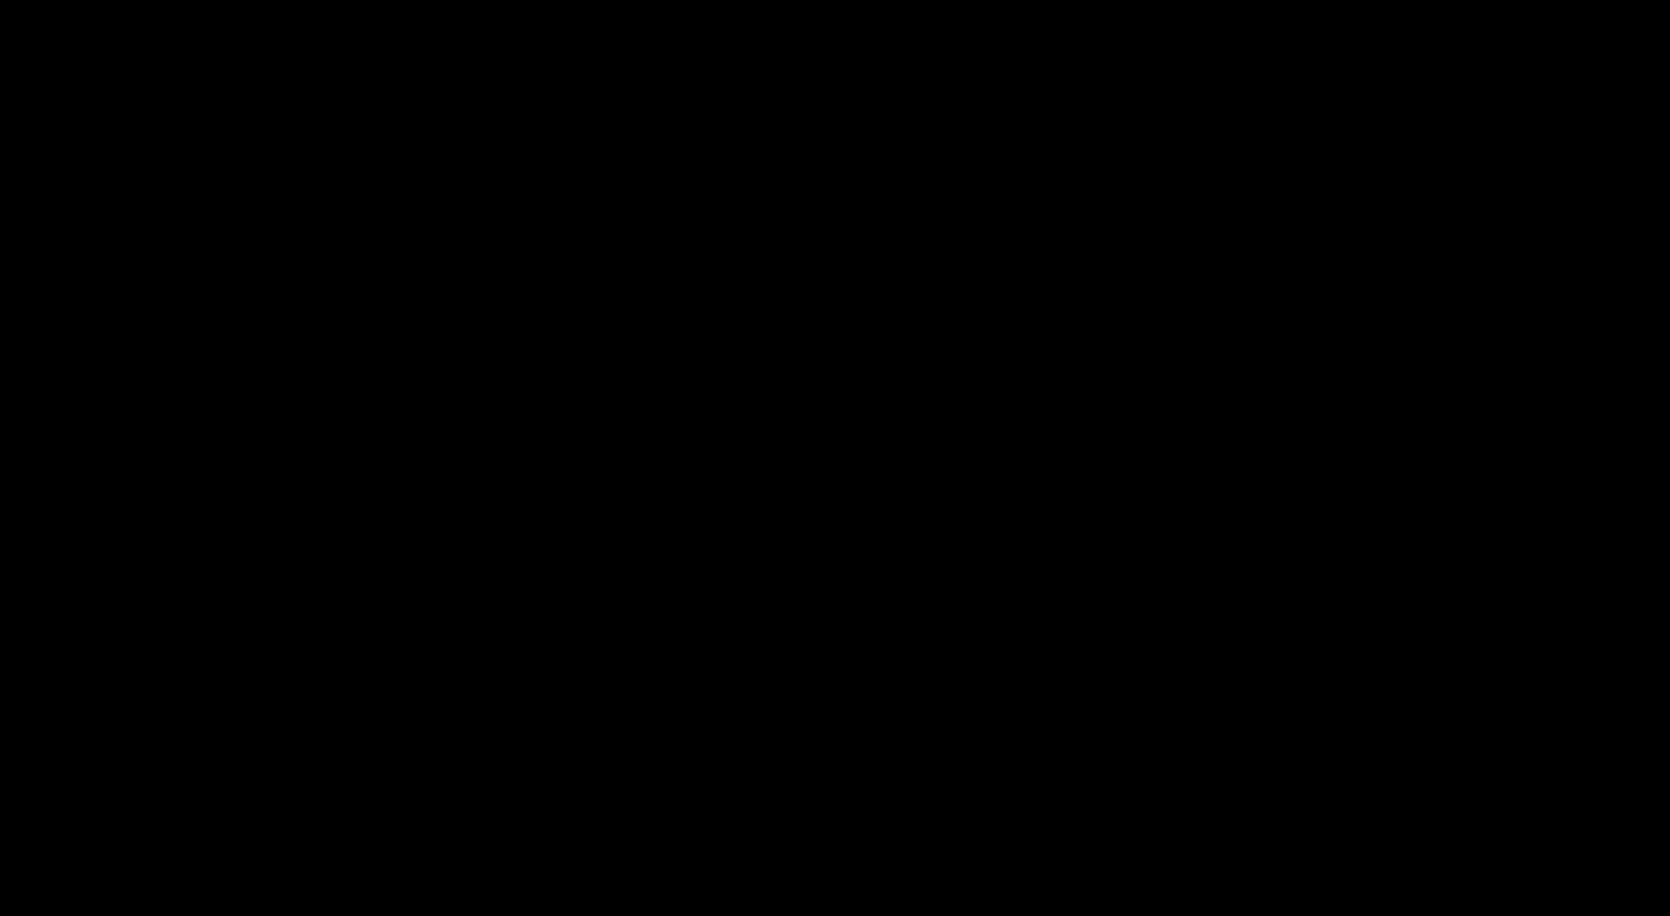 5-Bromo-4-chloro-3-indolyl-α-D-N-acetylneuraminic acid methyl ester